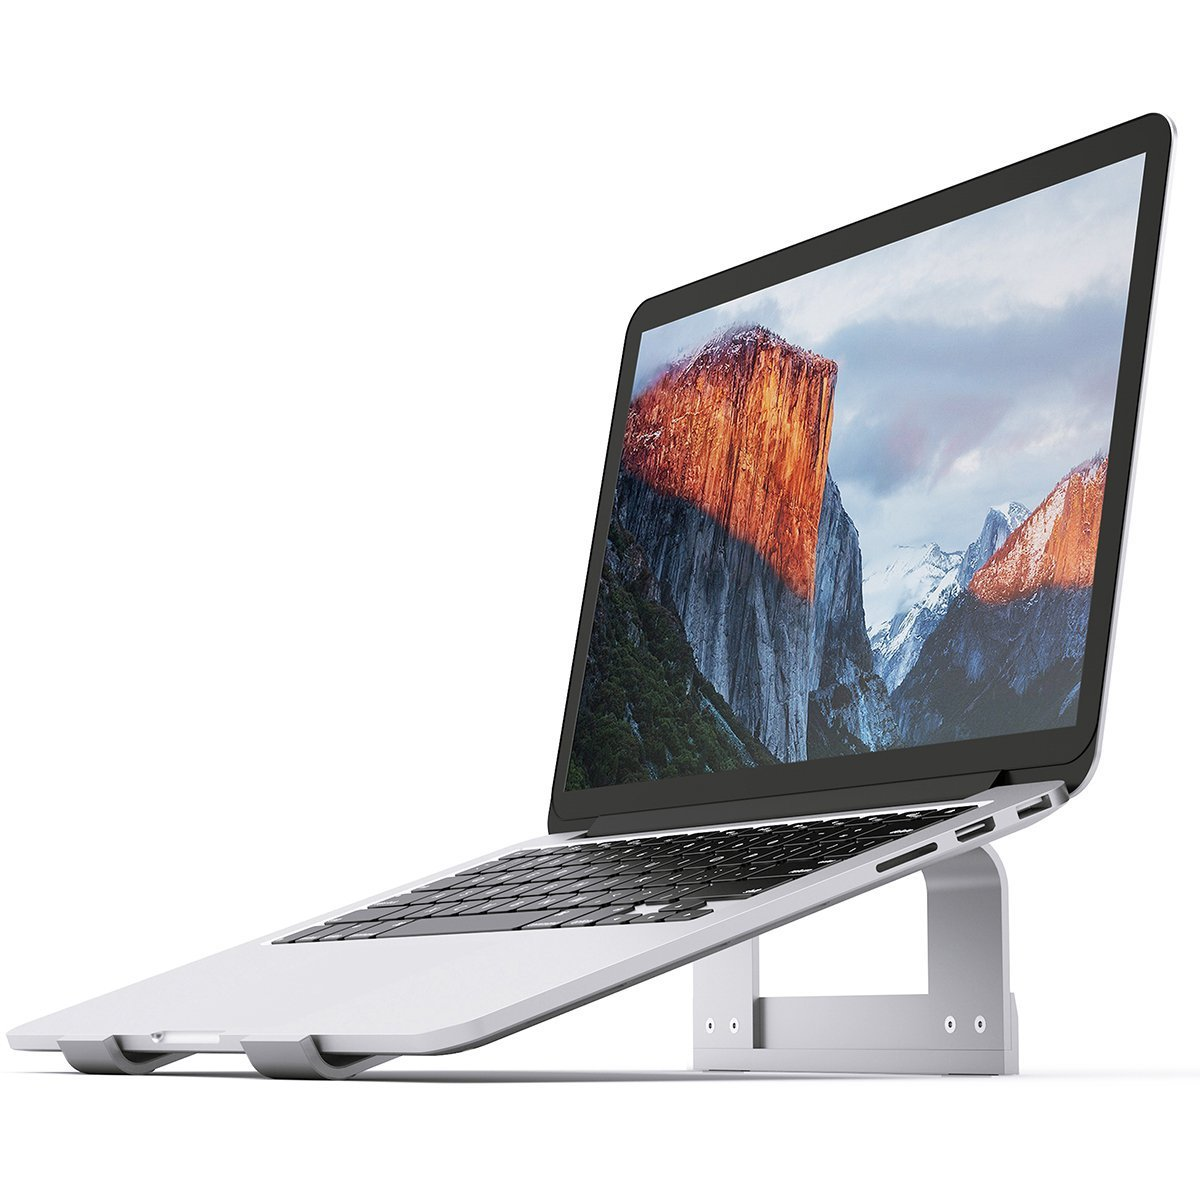 Laptop Stand OBA Aluminum Ventilated Stand UPDATE VERSION - Ergonomic Riser Portable Holder for Macbook Pro, All Notebooks